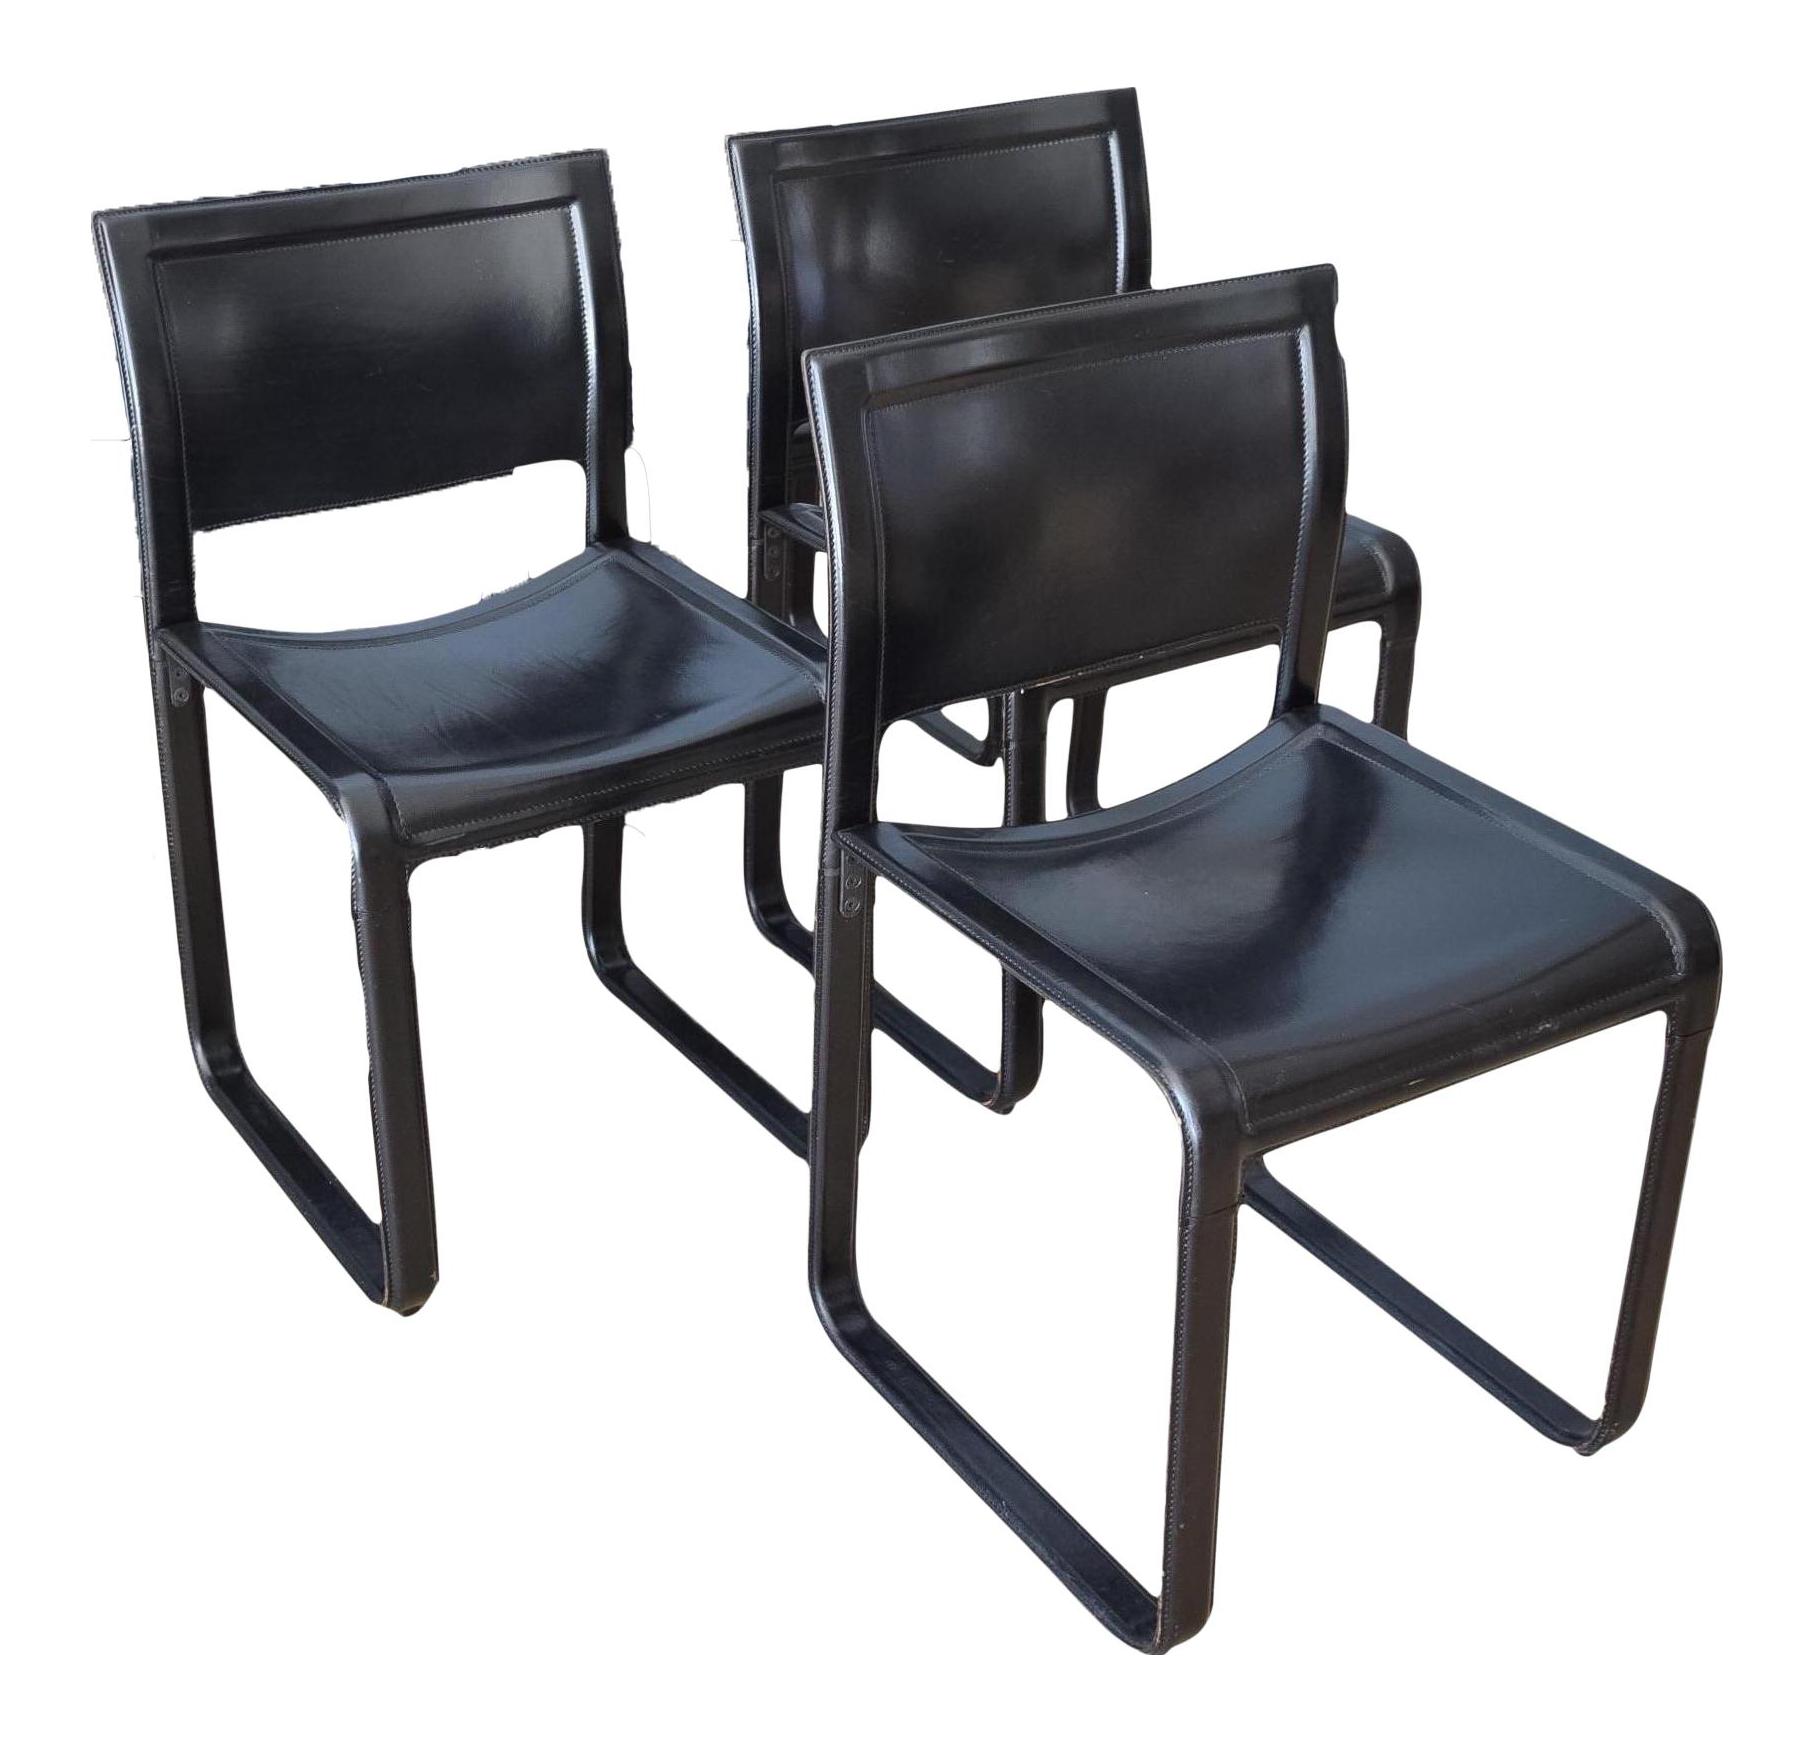 Merveilleux Matteo Grassi Sistina Strap Black Leather Dining Chairs   Set Of 3 |  Chairish